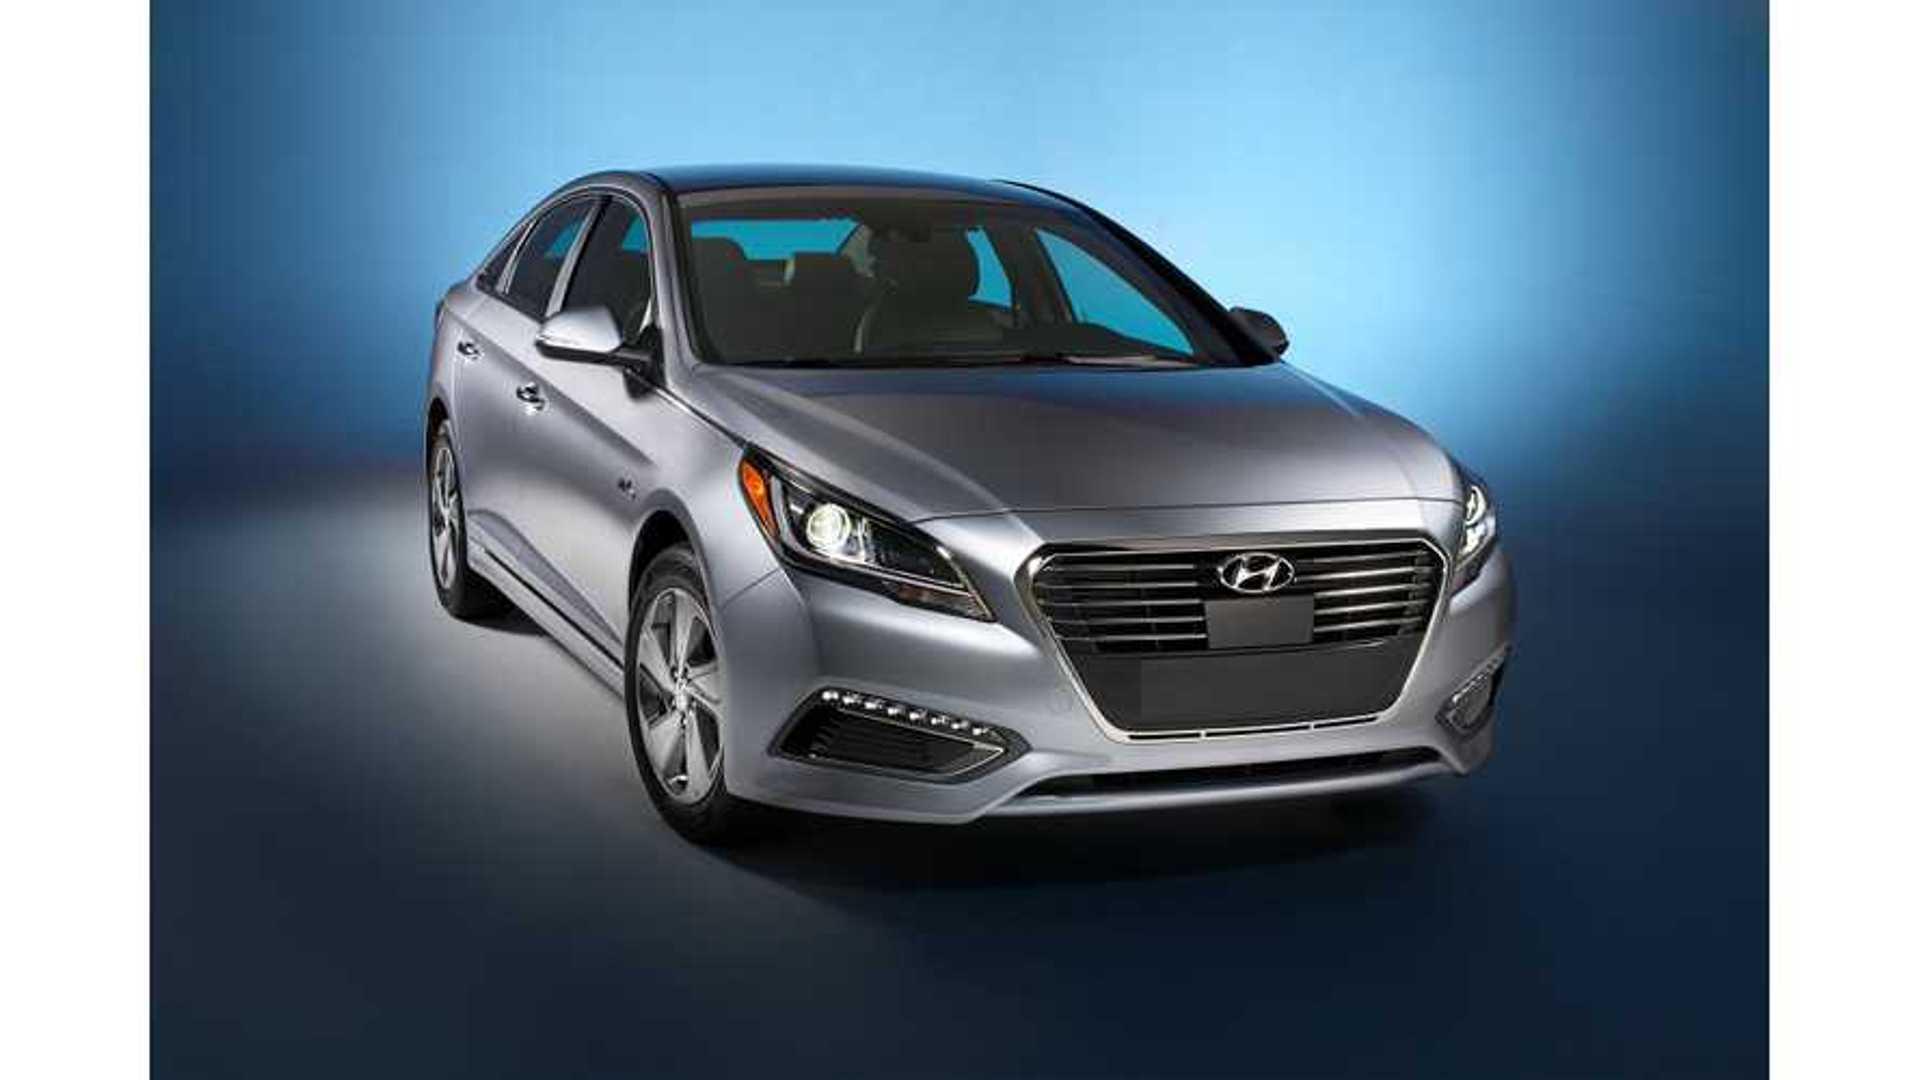 Hyundai Sonata Phev Gets Up To 27 Miles Of Electric Range According Epa